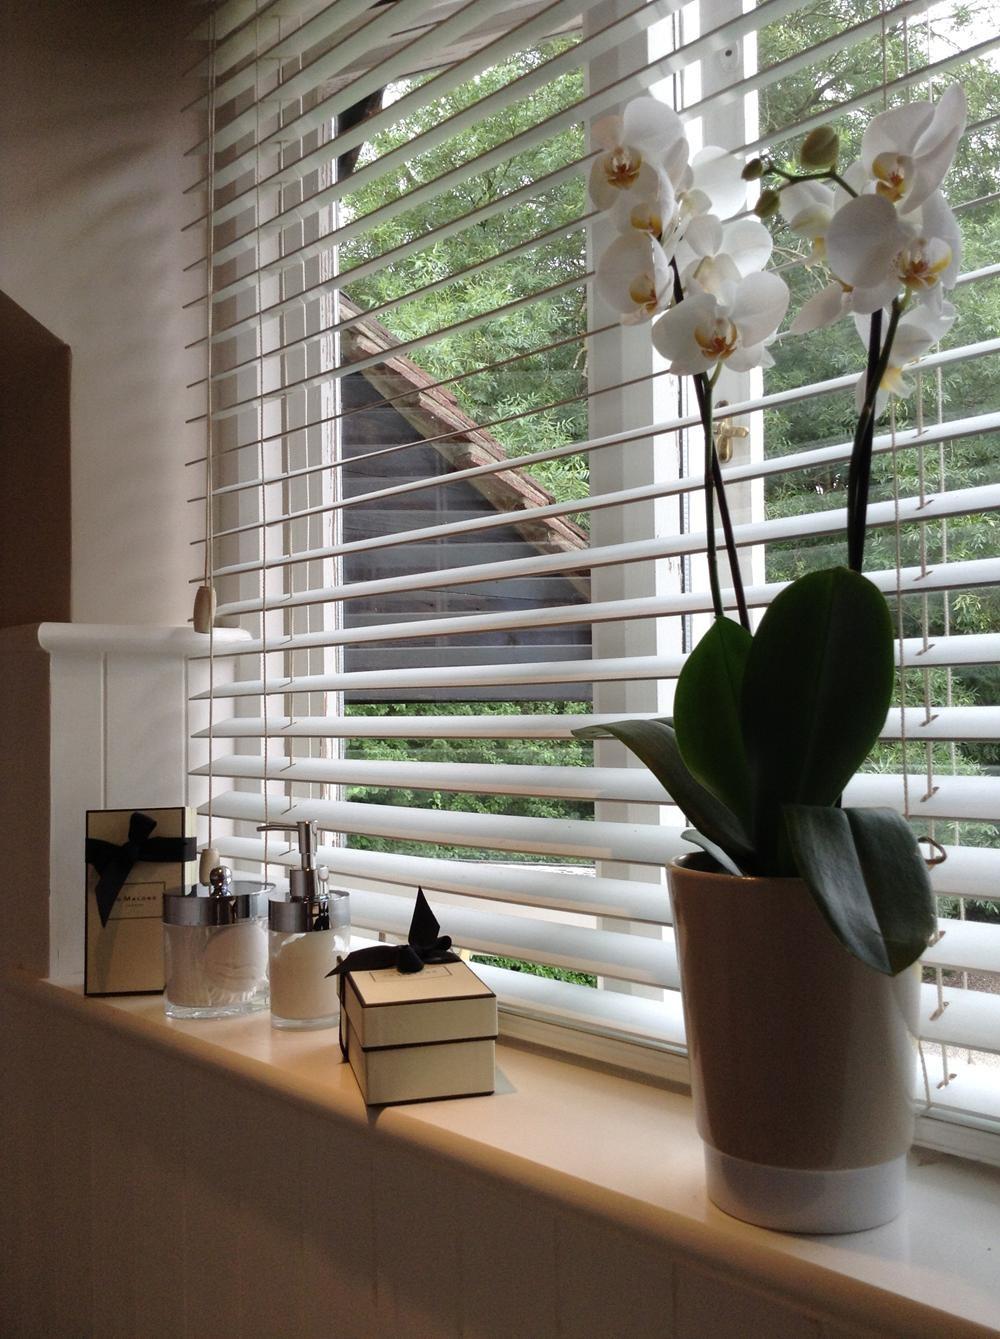 Adamo Interiors Has a Passionate Vision for Creating Bespoke Design 2